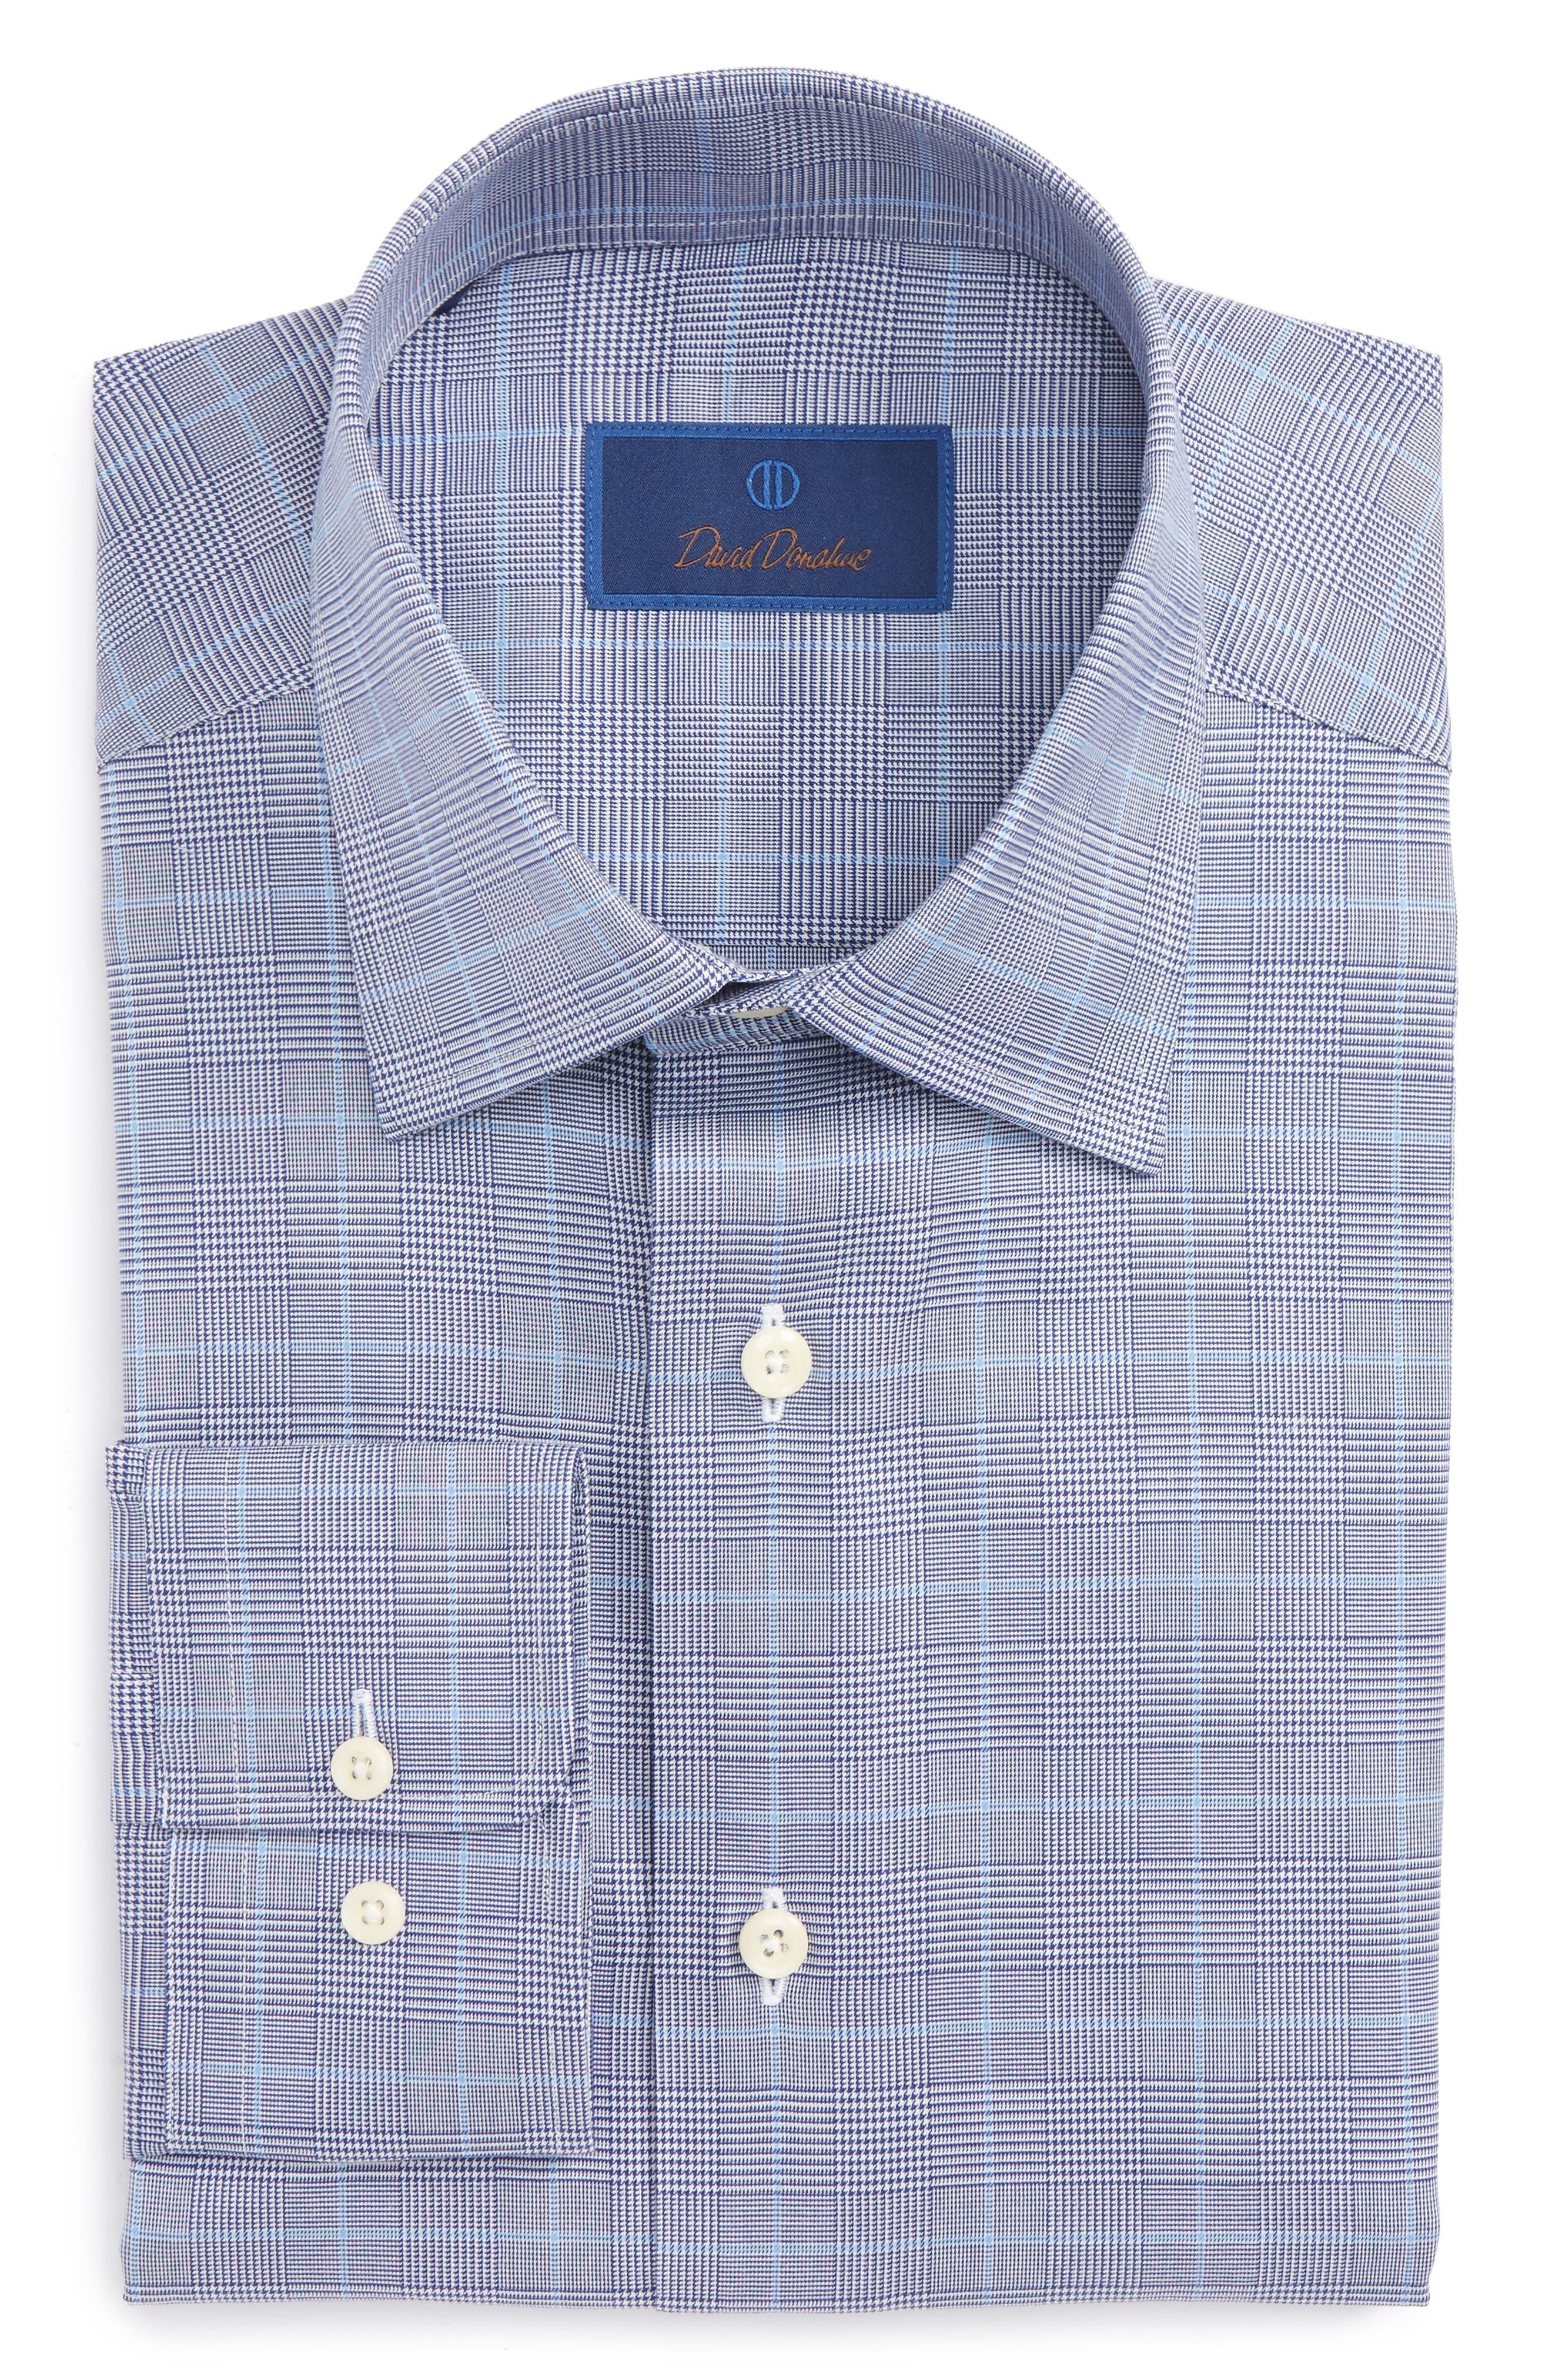 Regular Fit Plaid Dress Shirt,                             Main thumbnail 1, color,                             Navy